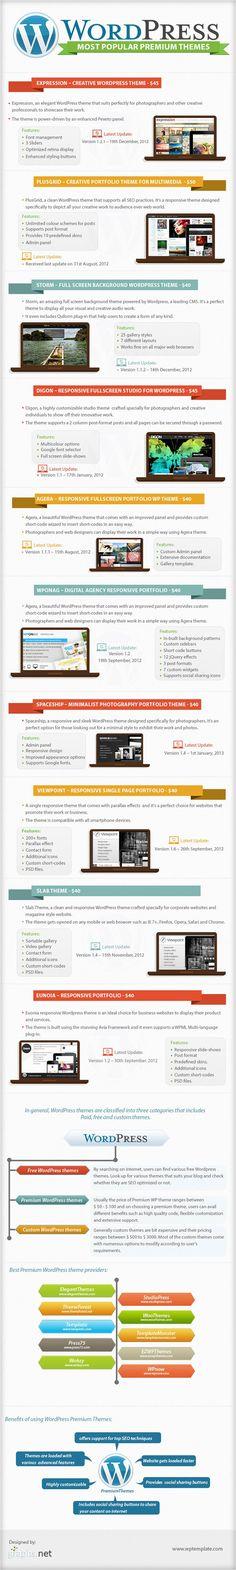 Most Popular WordPress Premium Themes, an infographic - http://hosting.ber-art.nl/most-popular-wordpress-premium-themes-an-infographic/ /@Roberta Causarano Causarano Cruz Malonda|Art Visual Design V.O.F. - #SEO